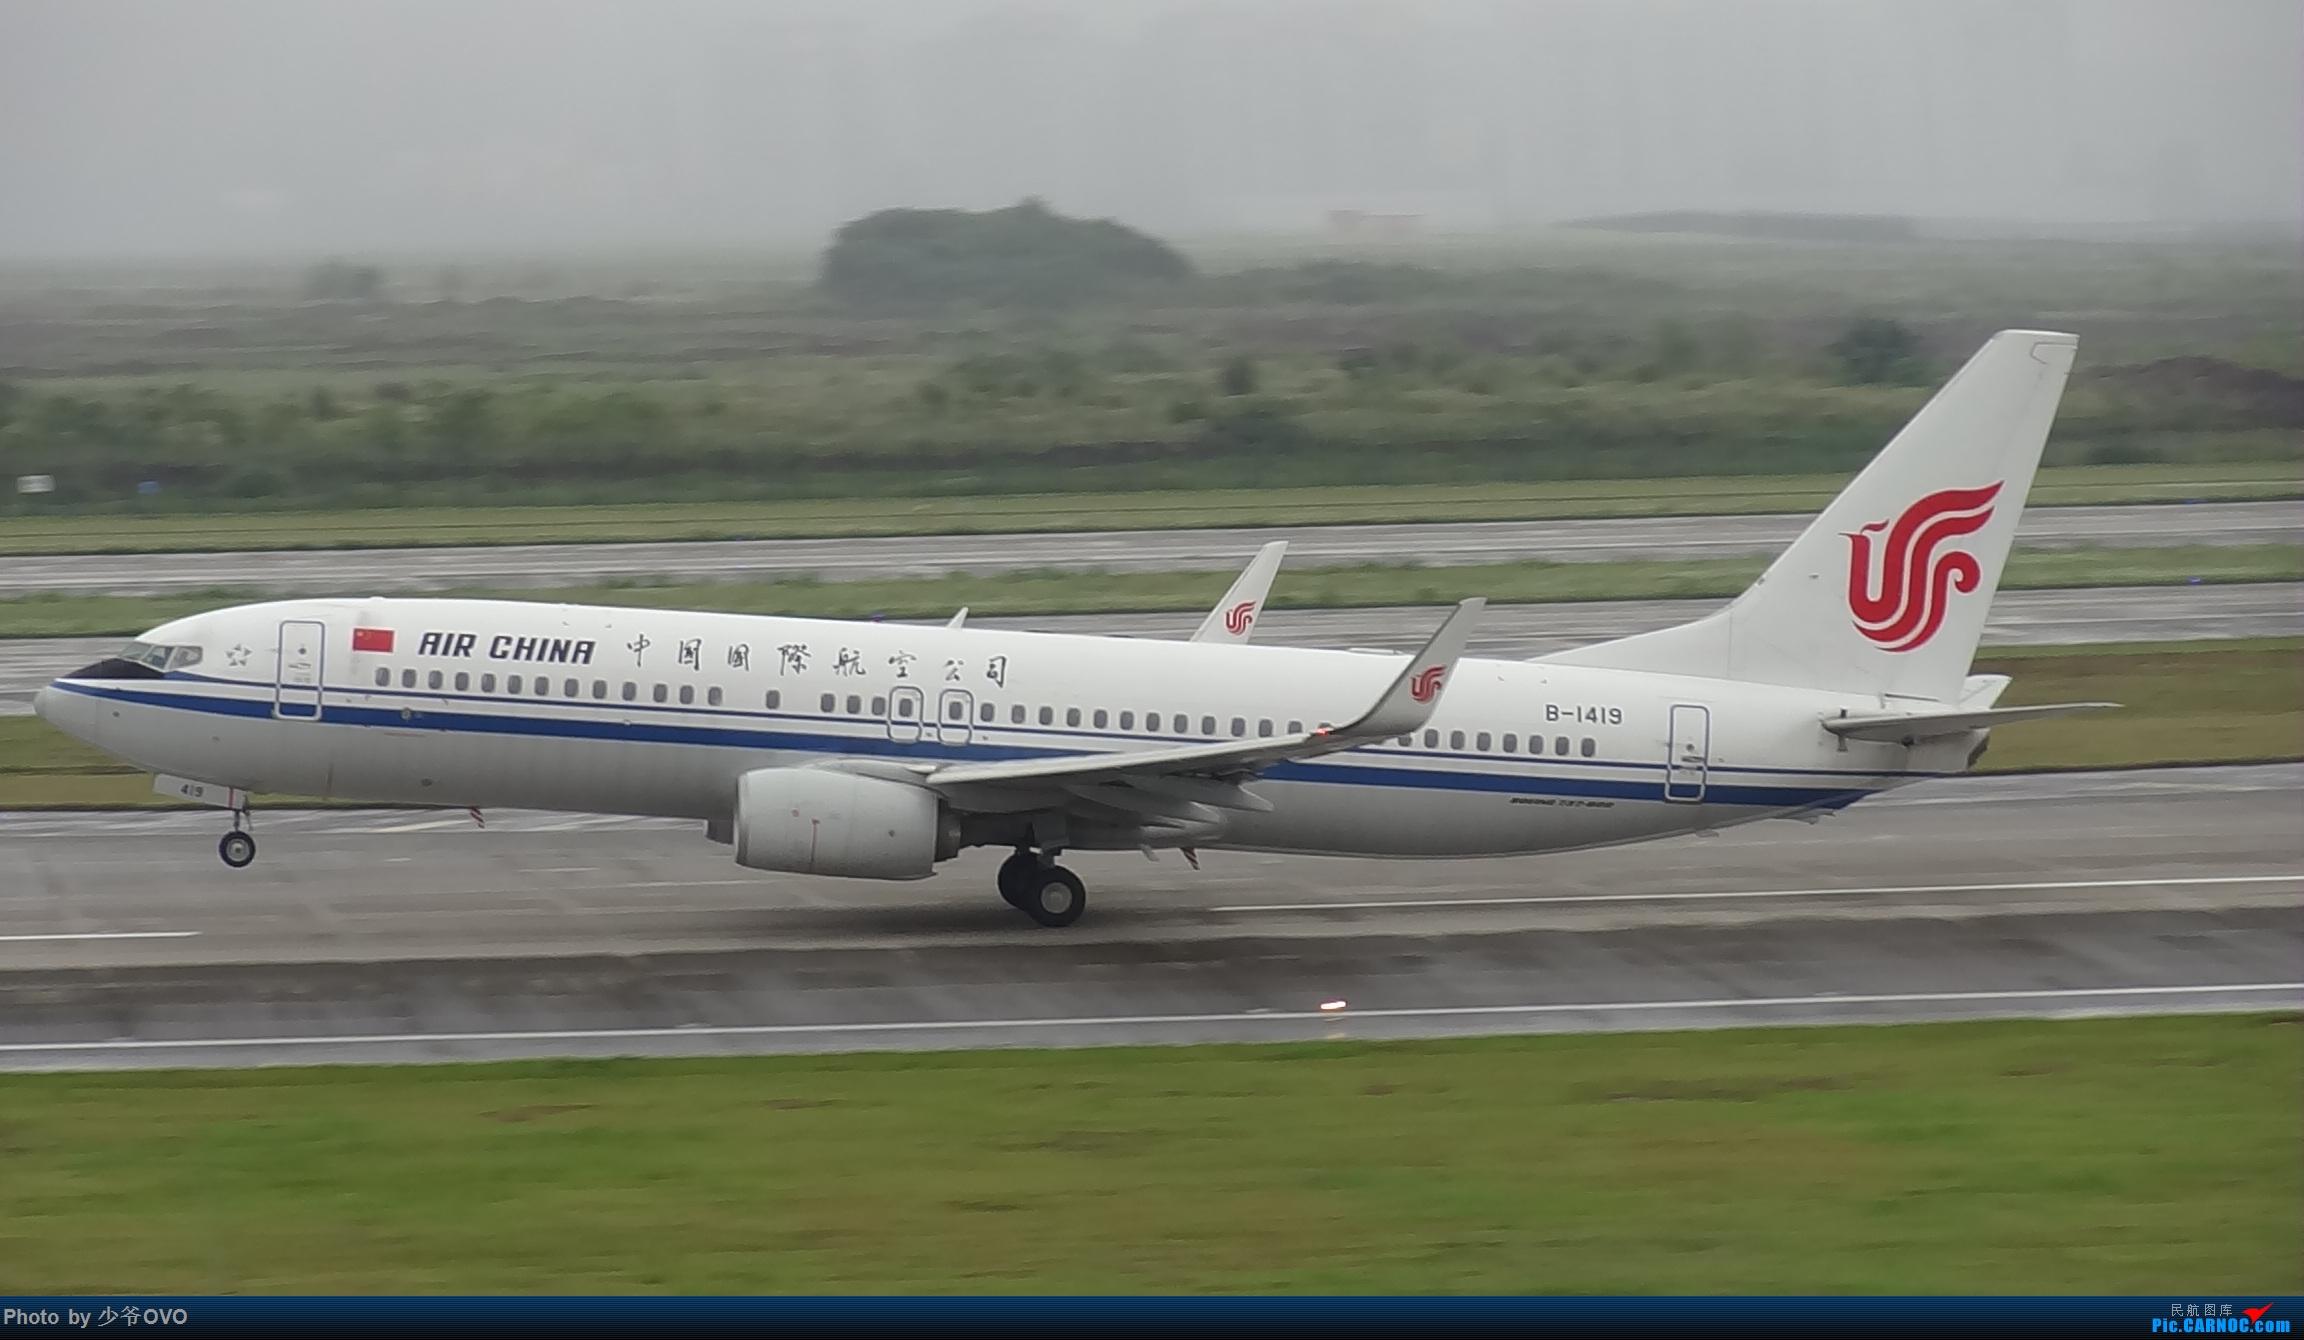 Re:[原创]CKG重庆江北机场拍机 ,中法建交50周年 BOEING 737-800 B-1959 中国重庆江北国际机场